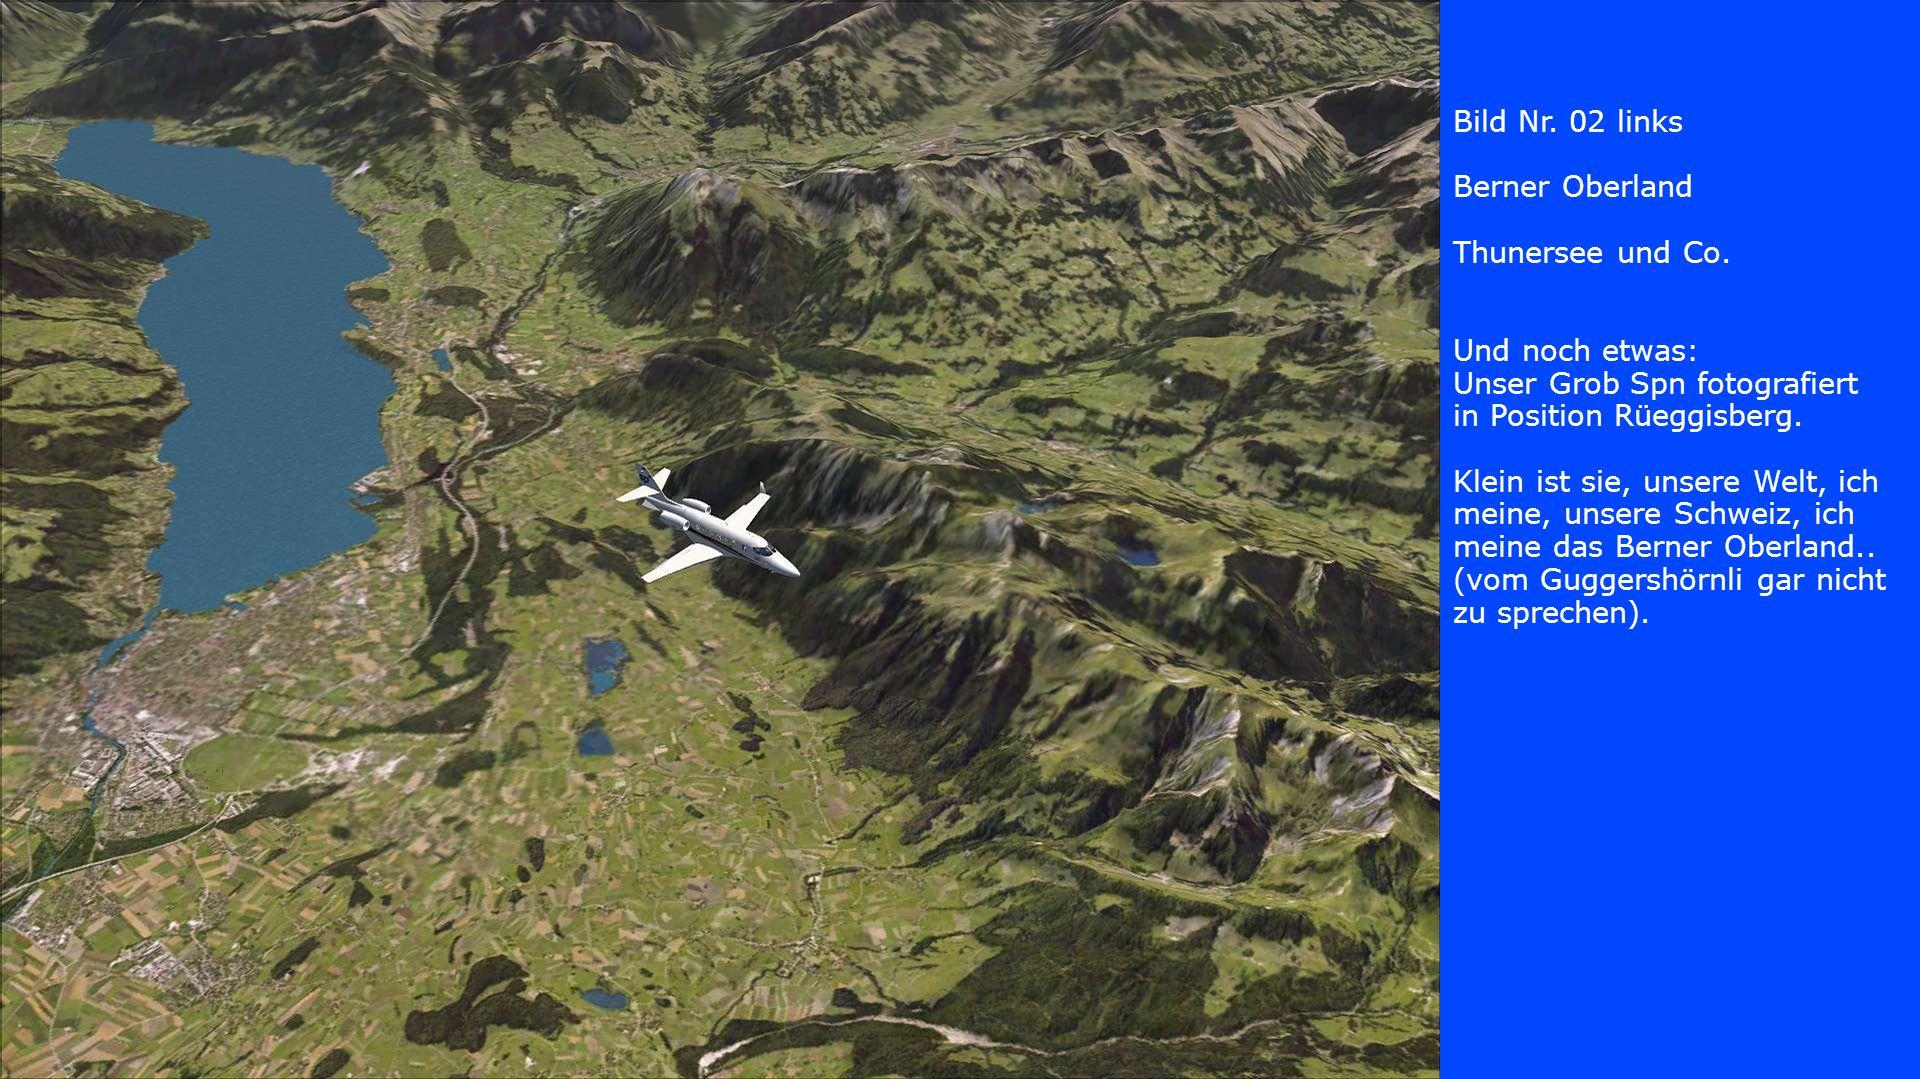 Bild Nr. 02 links Berner Oberland Thunersee und Co.